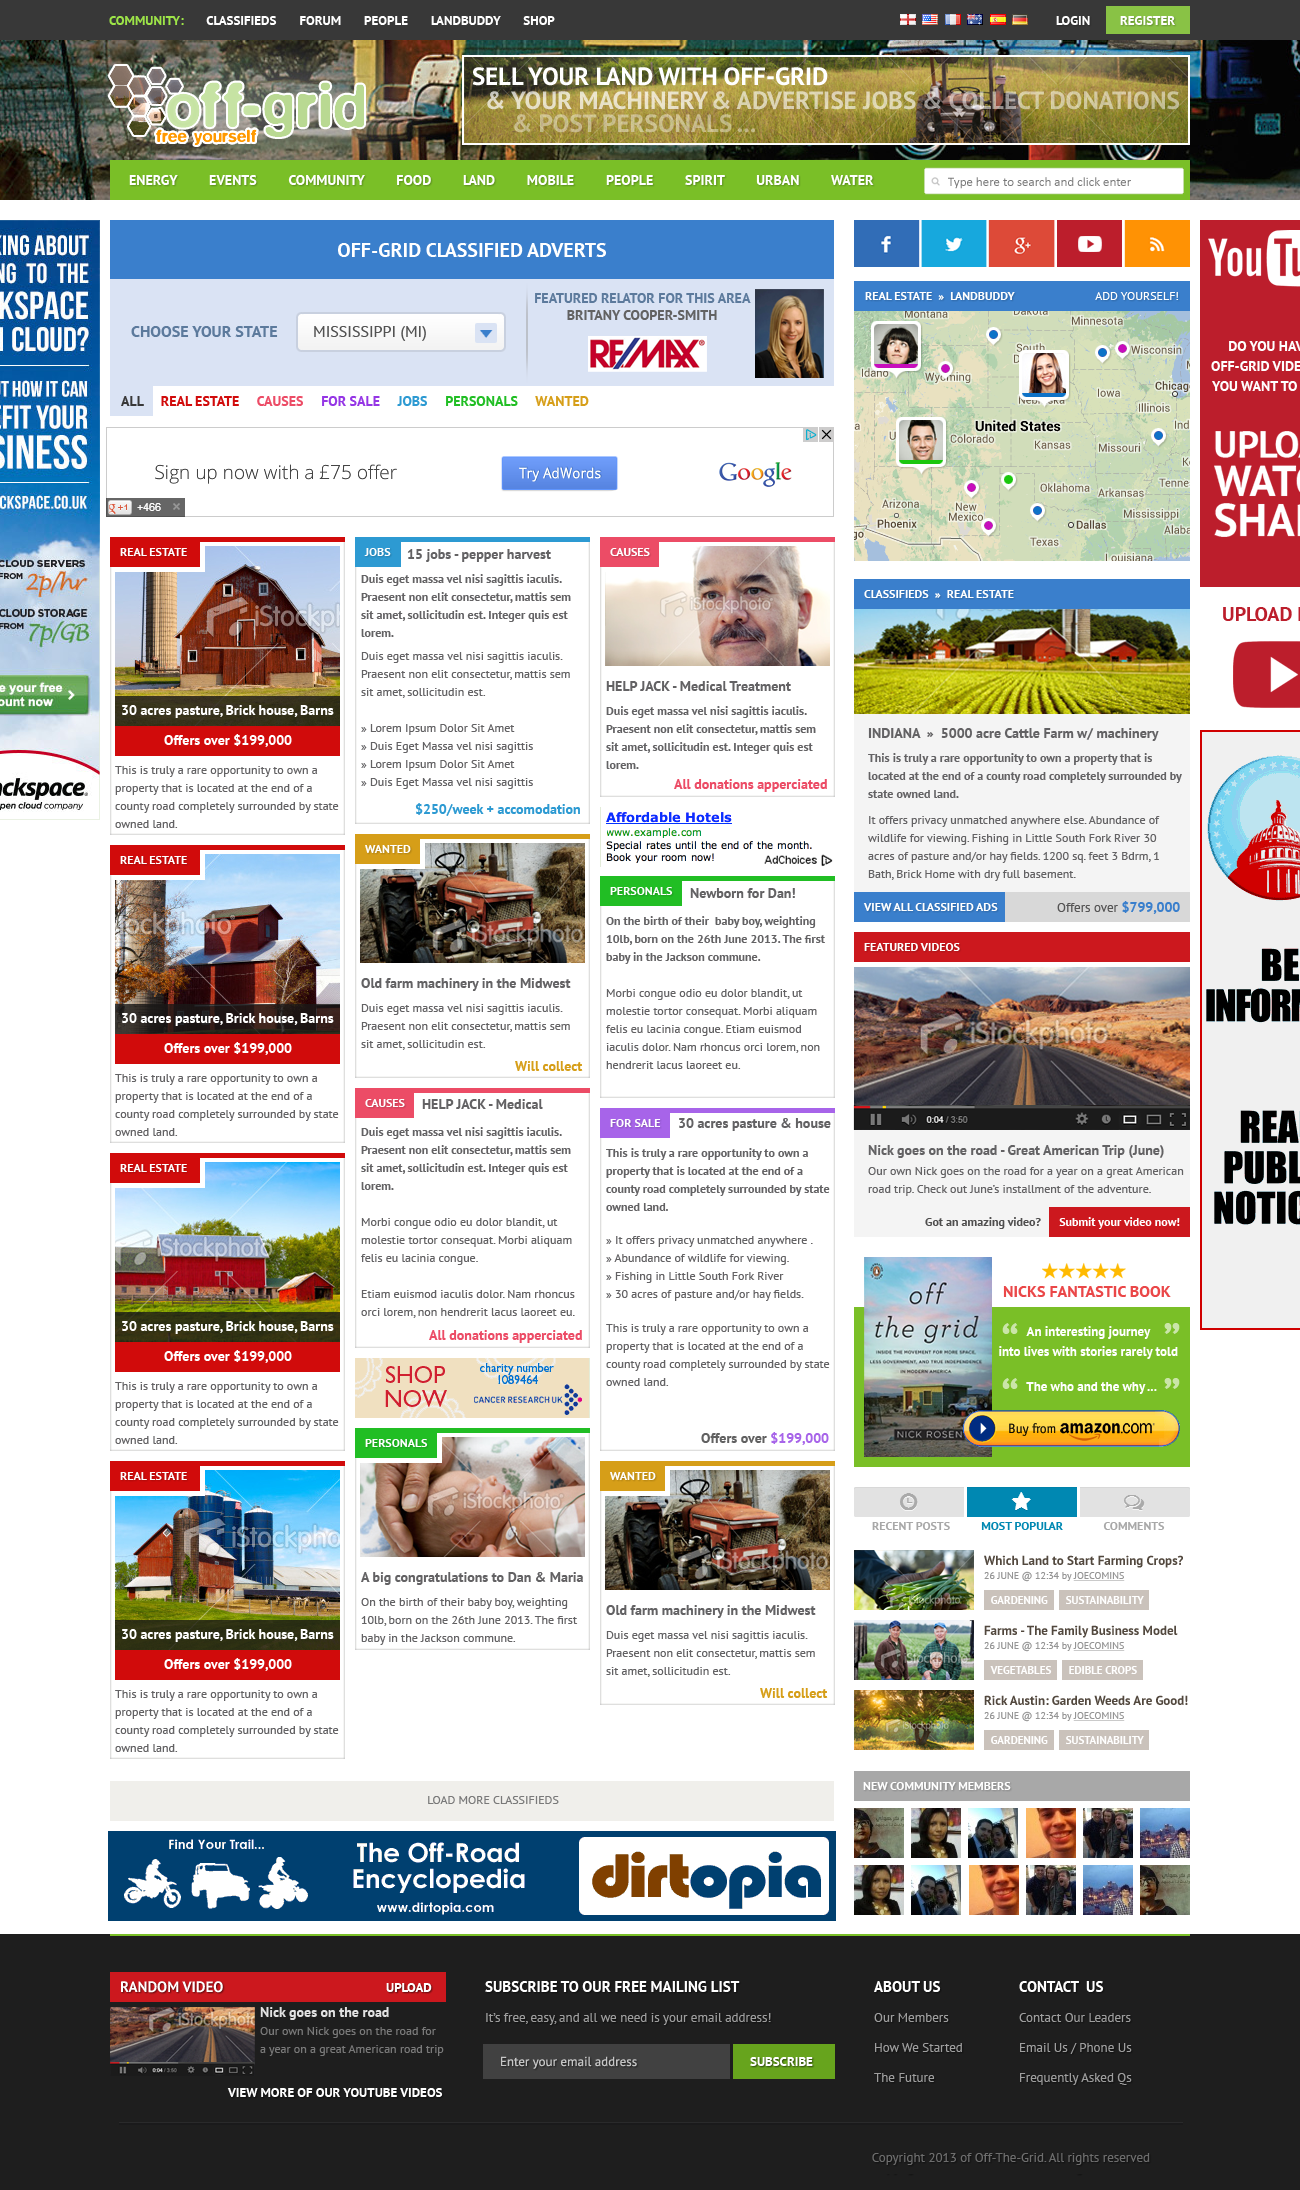 off-grid - real estate, community and news - website re-design